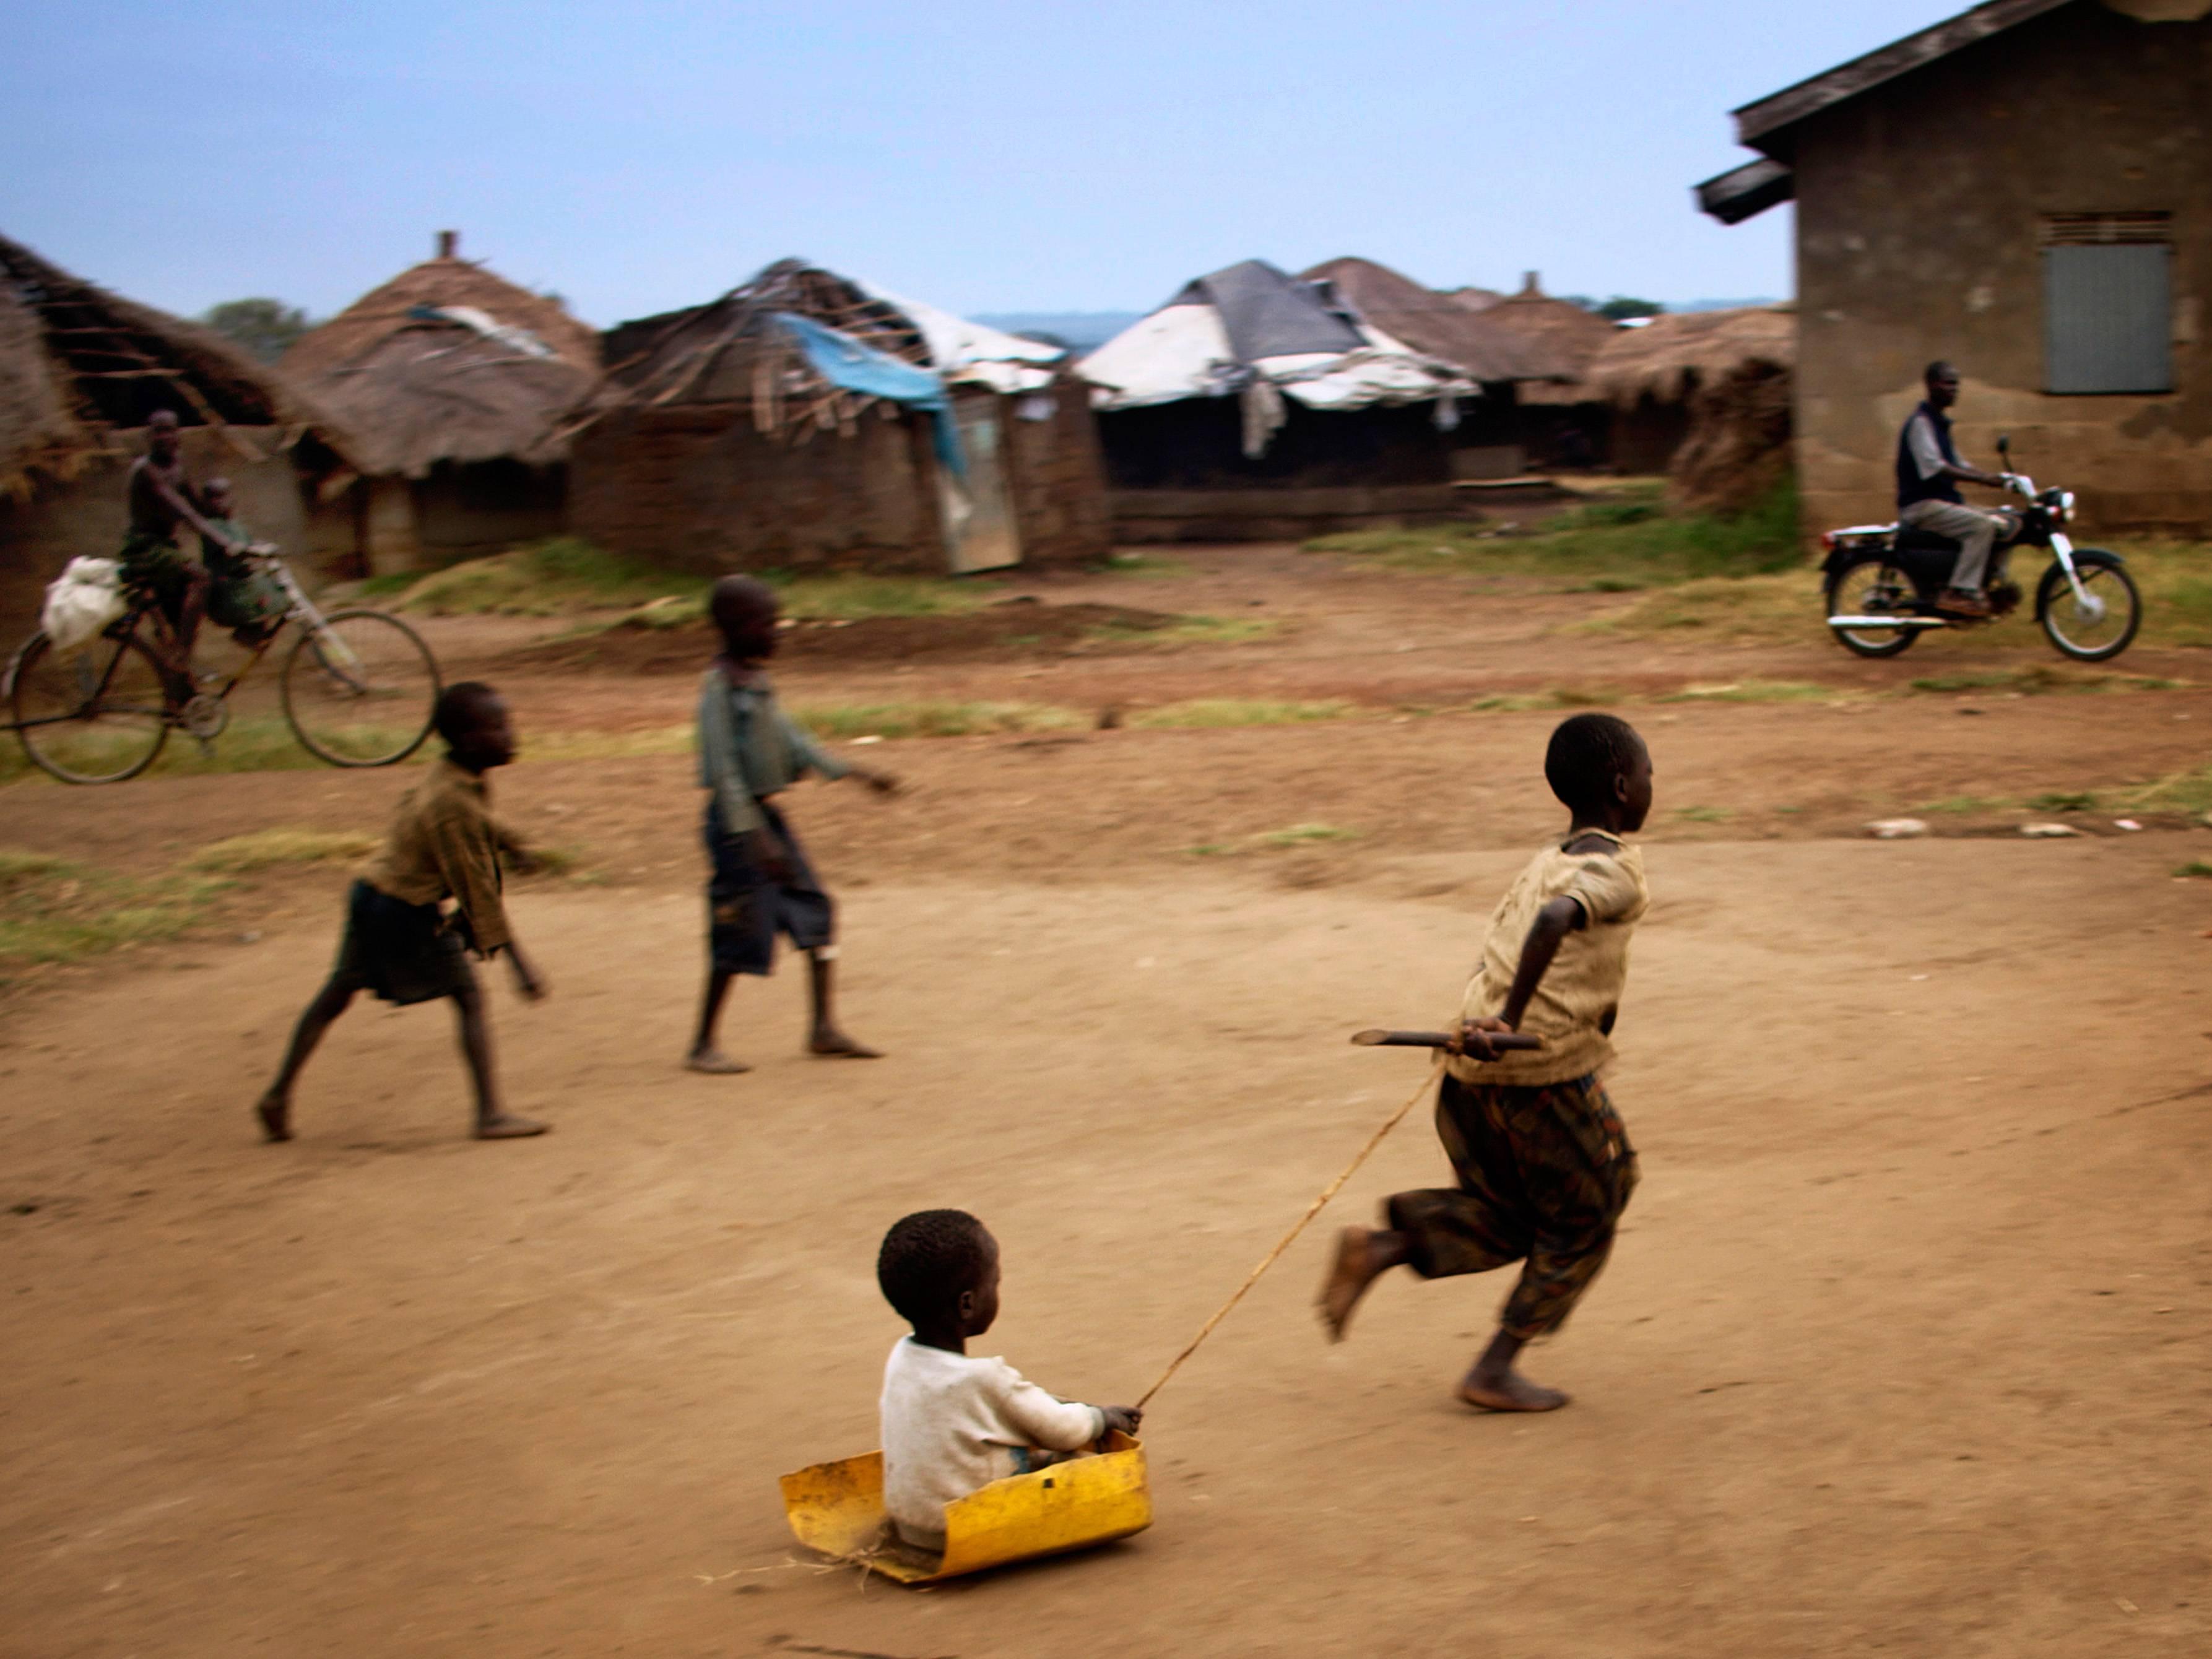 Village life in Uganda